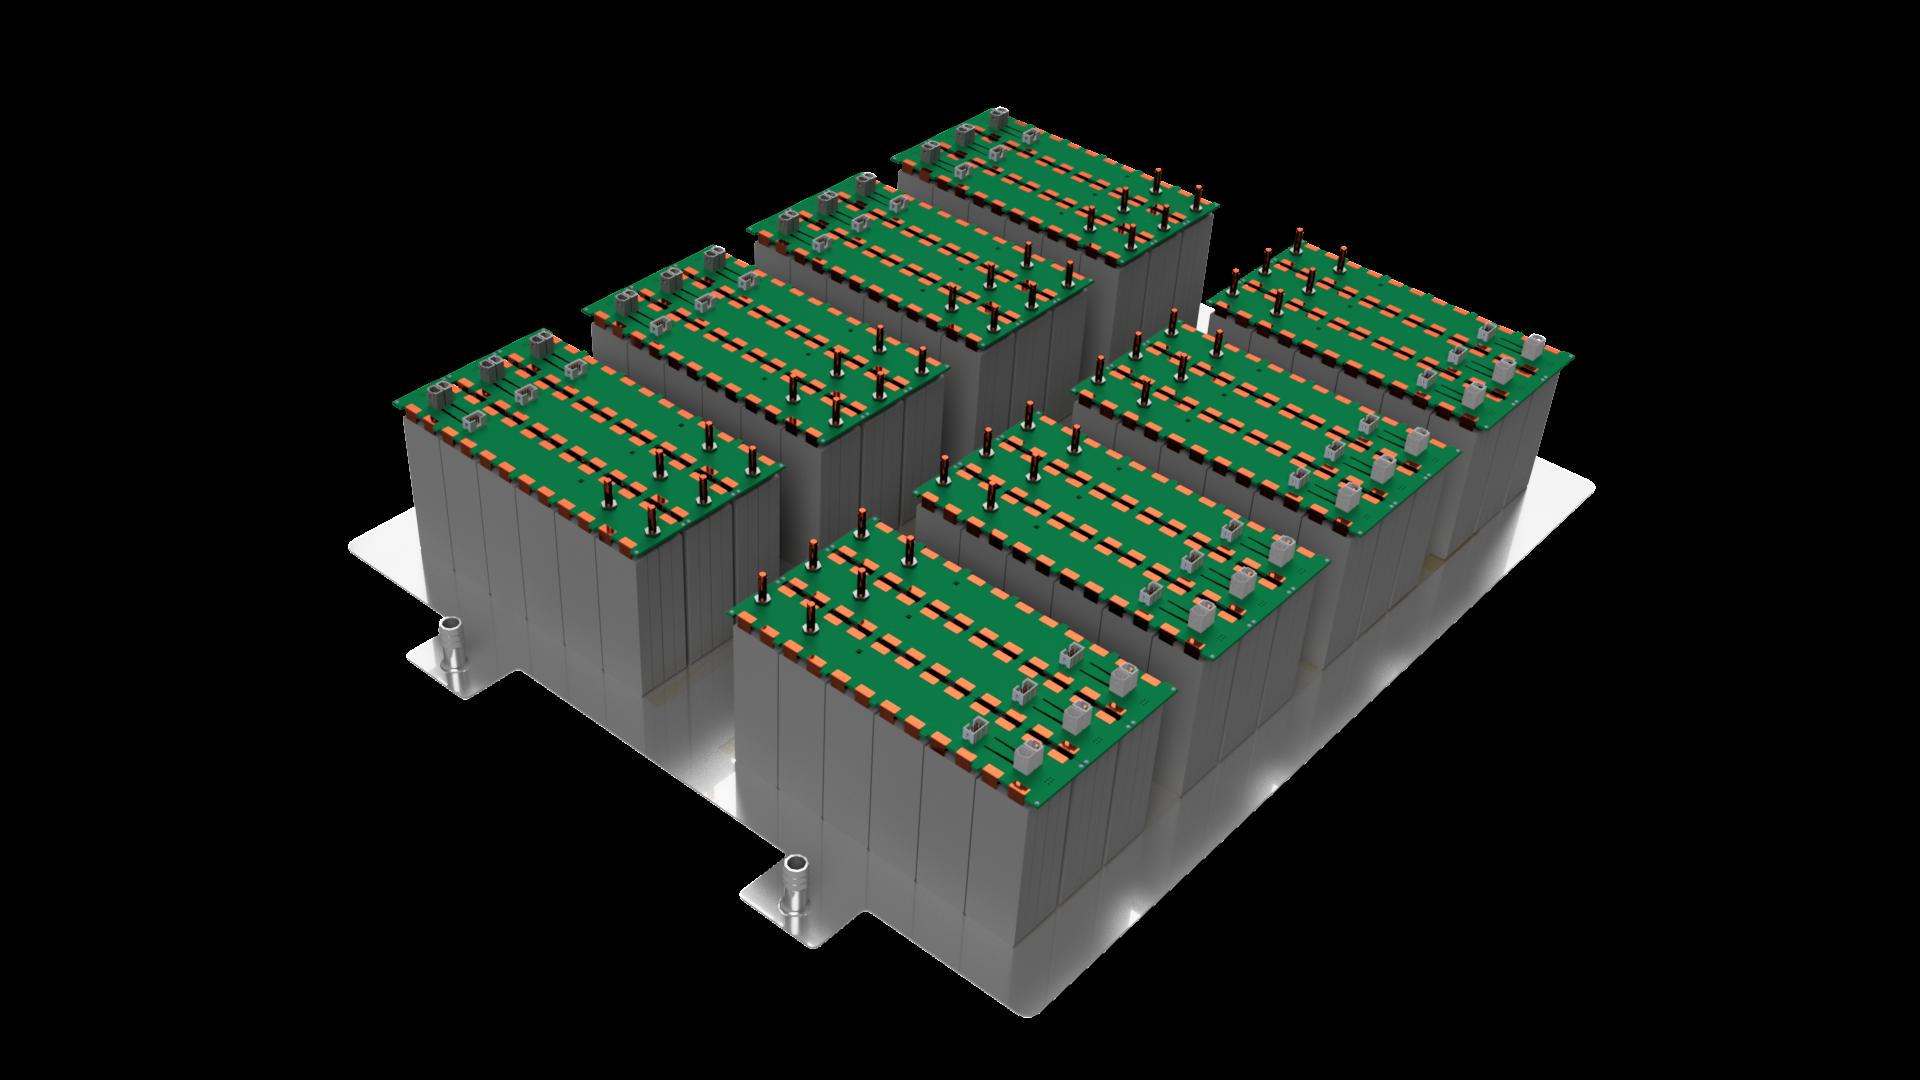 Using generative design to develop a modular battery pack